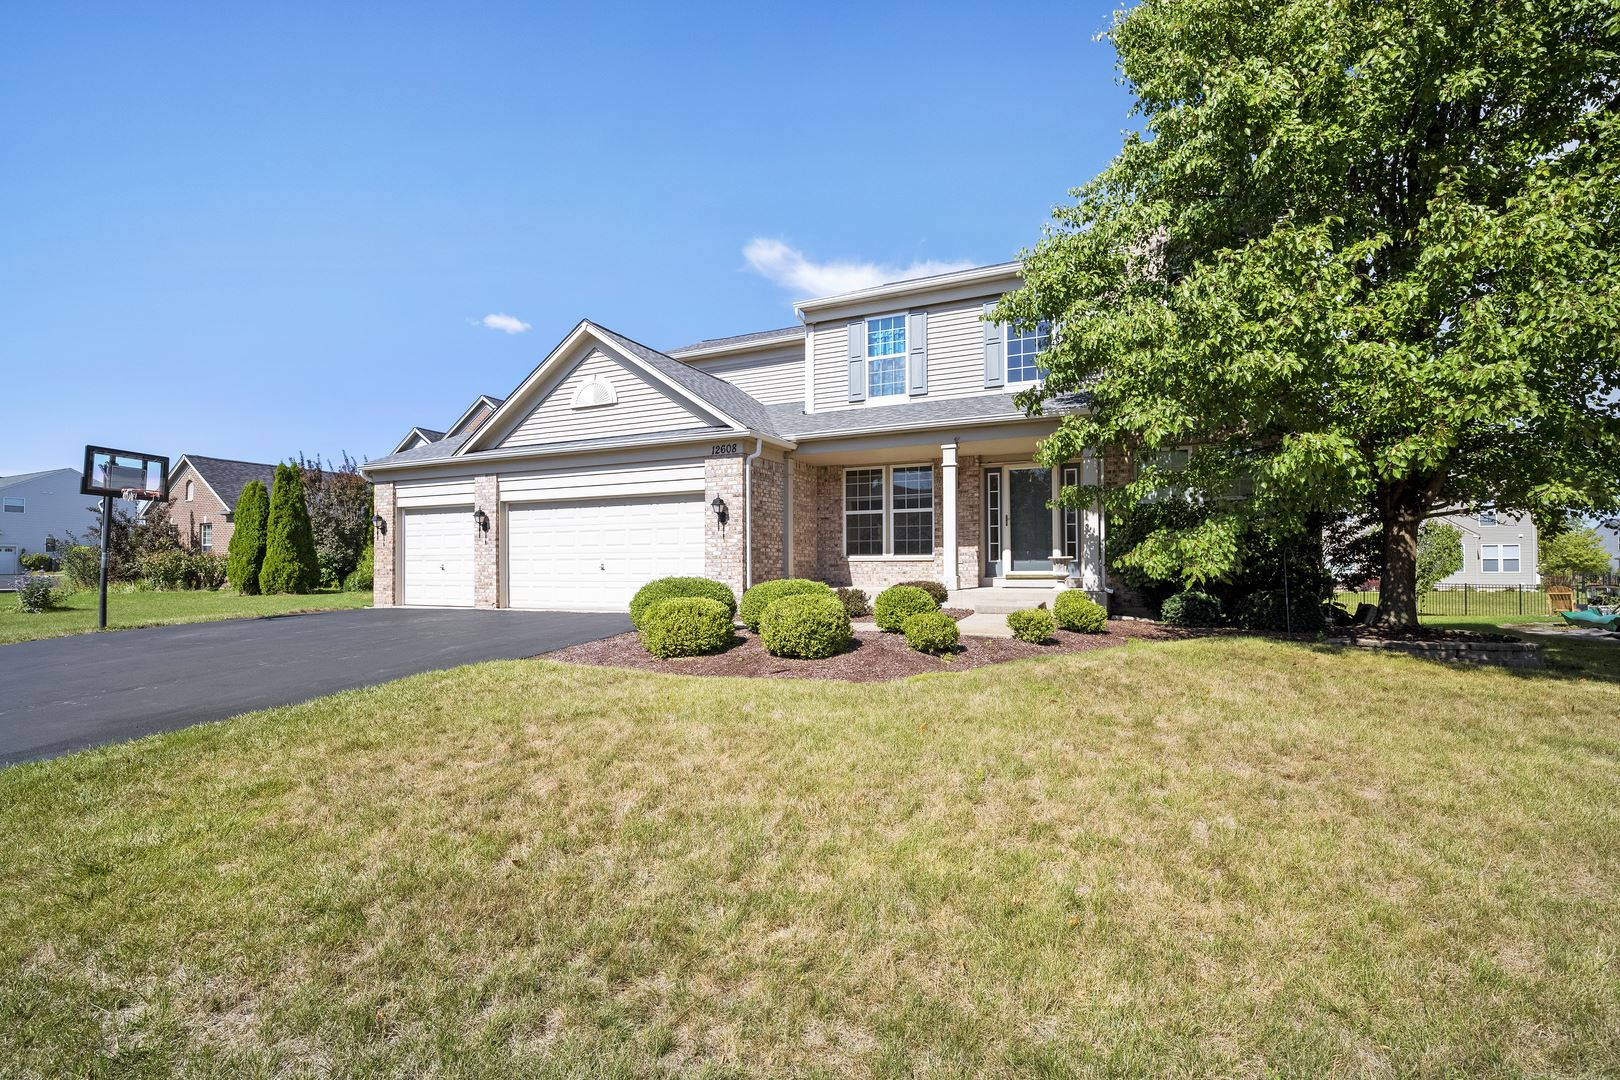 12608 Canterbury Drive, Plainfield, IL 60585 - #: 11230530